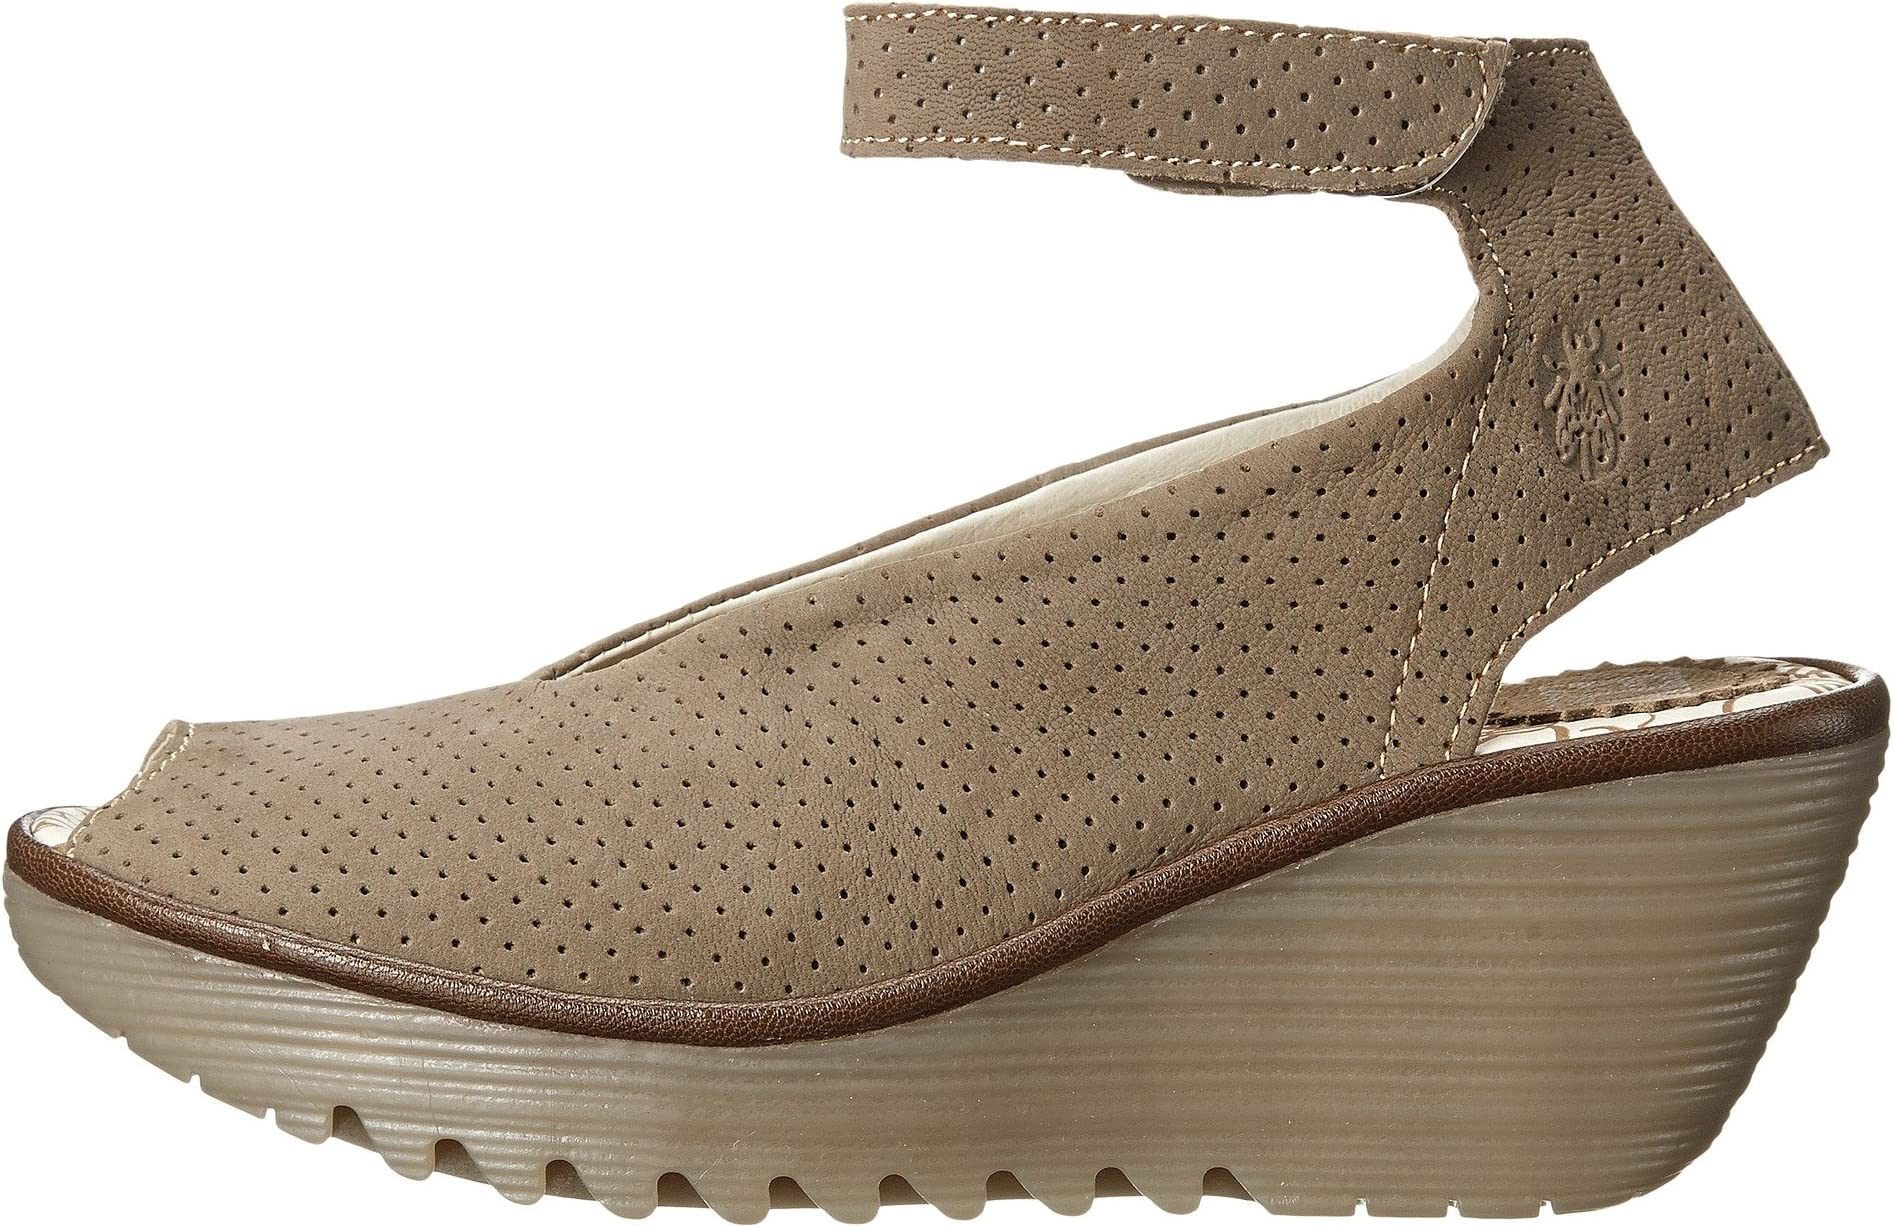 FLY LONDON Yala Perf | Women's shoes | 2020 Newest